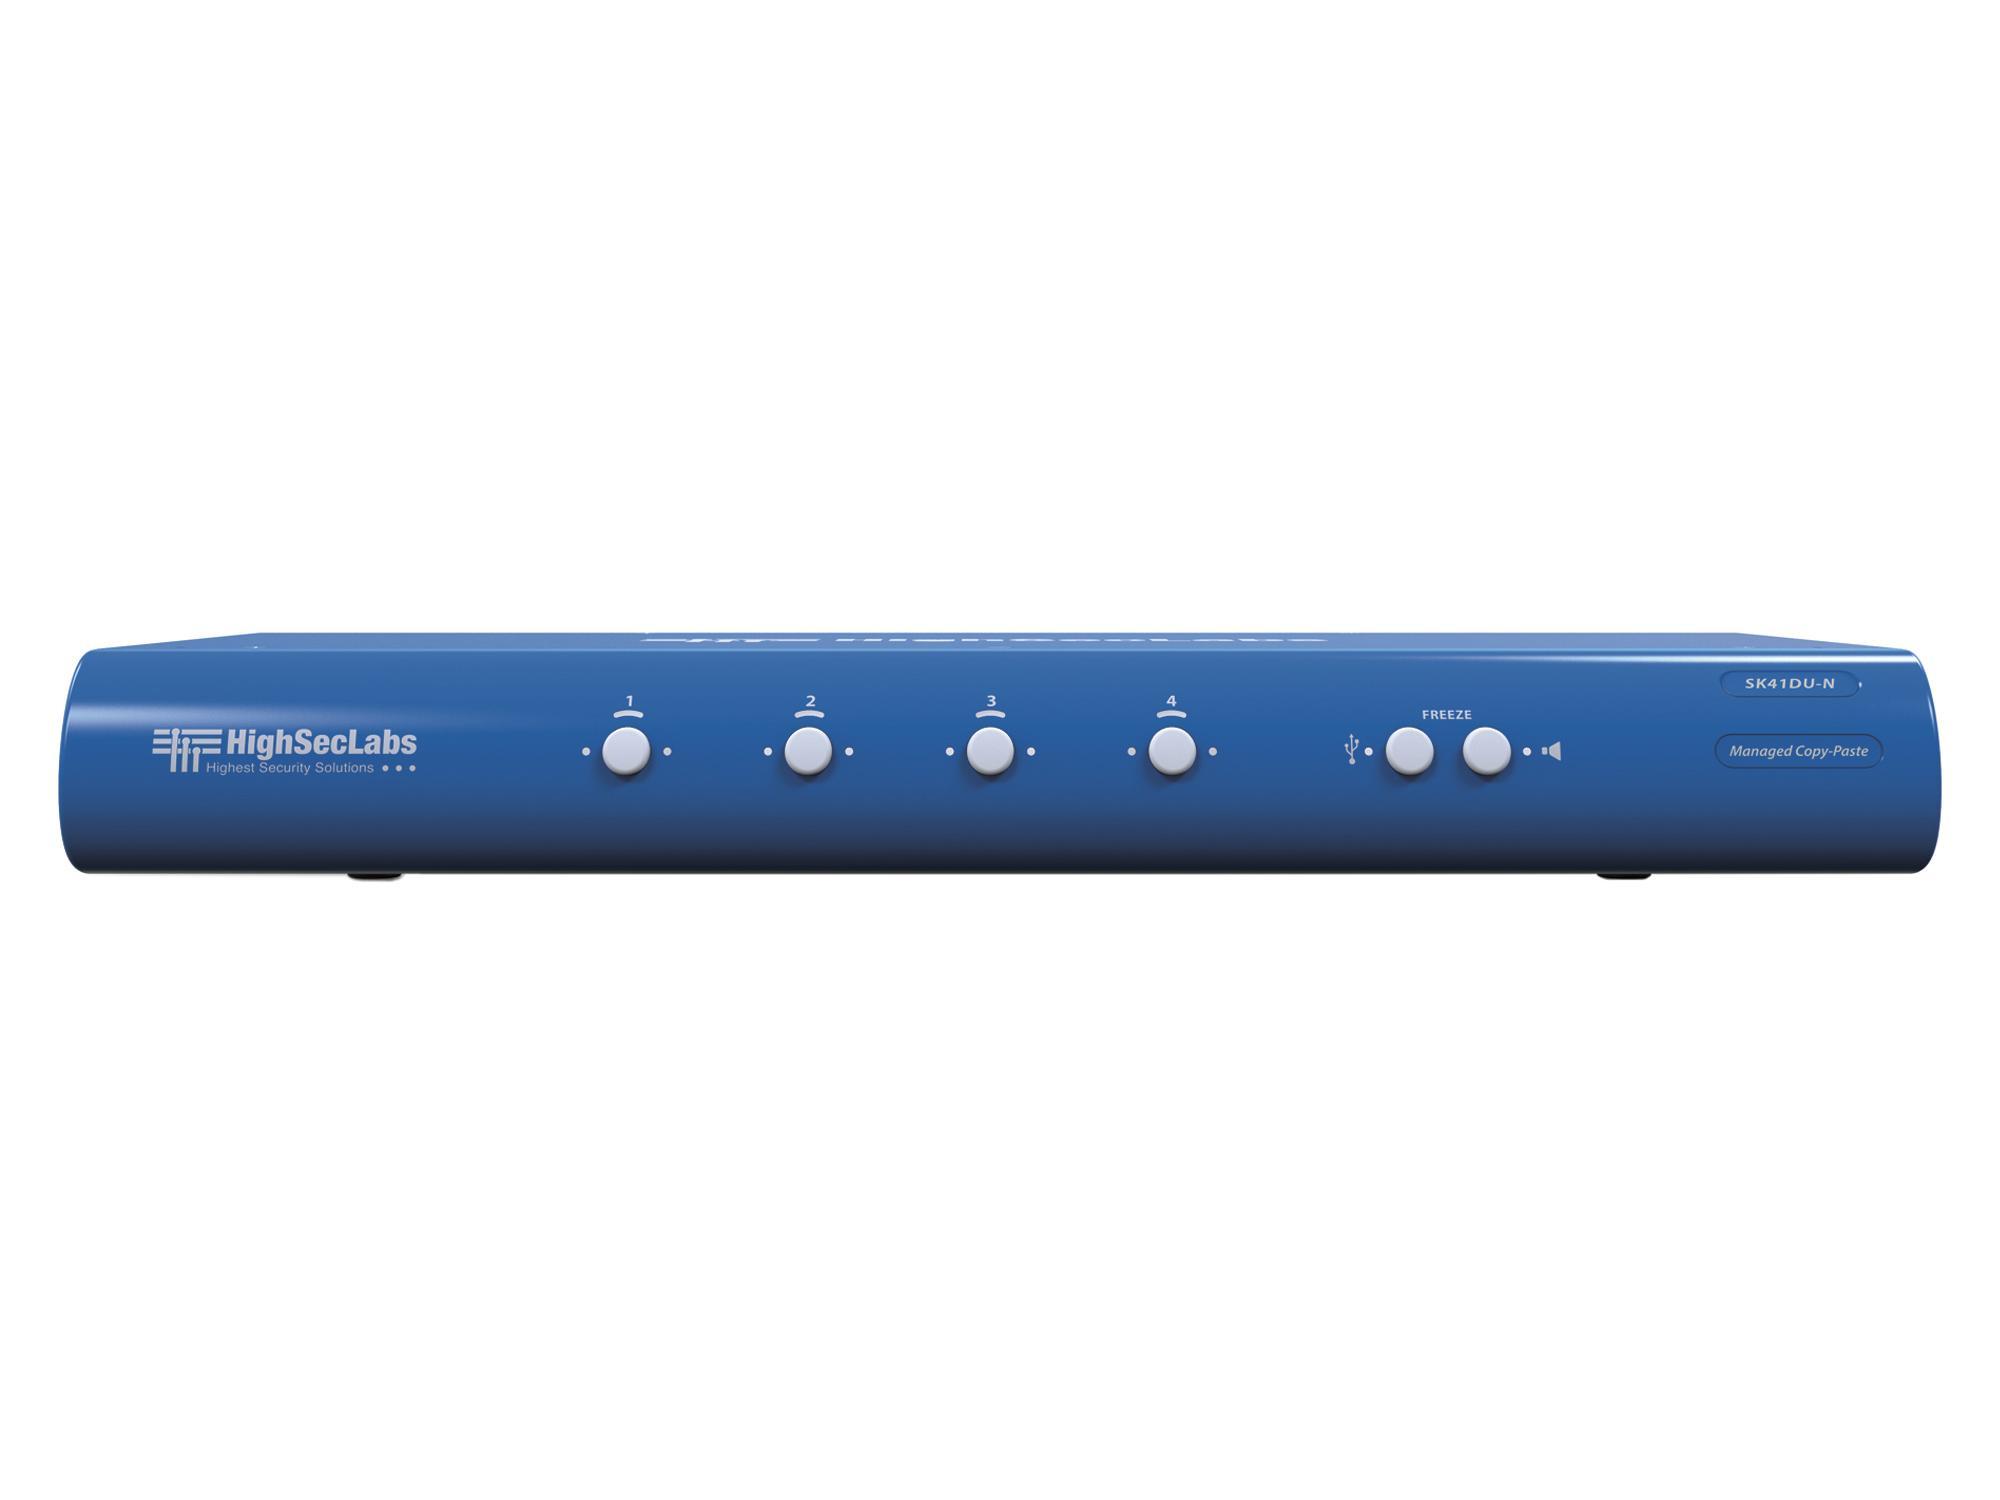 Kramer SK41DU-N HighSecLabs 4-Port 4K30 UHD DVI-I KVM Switch with sUSB